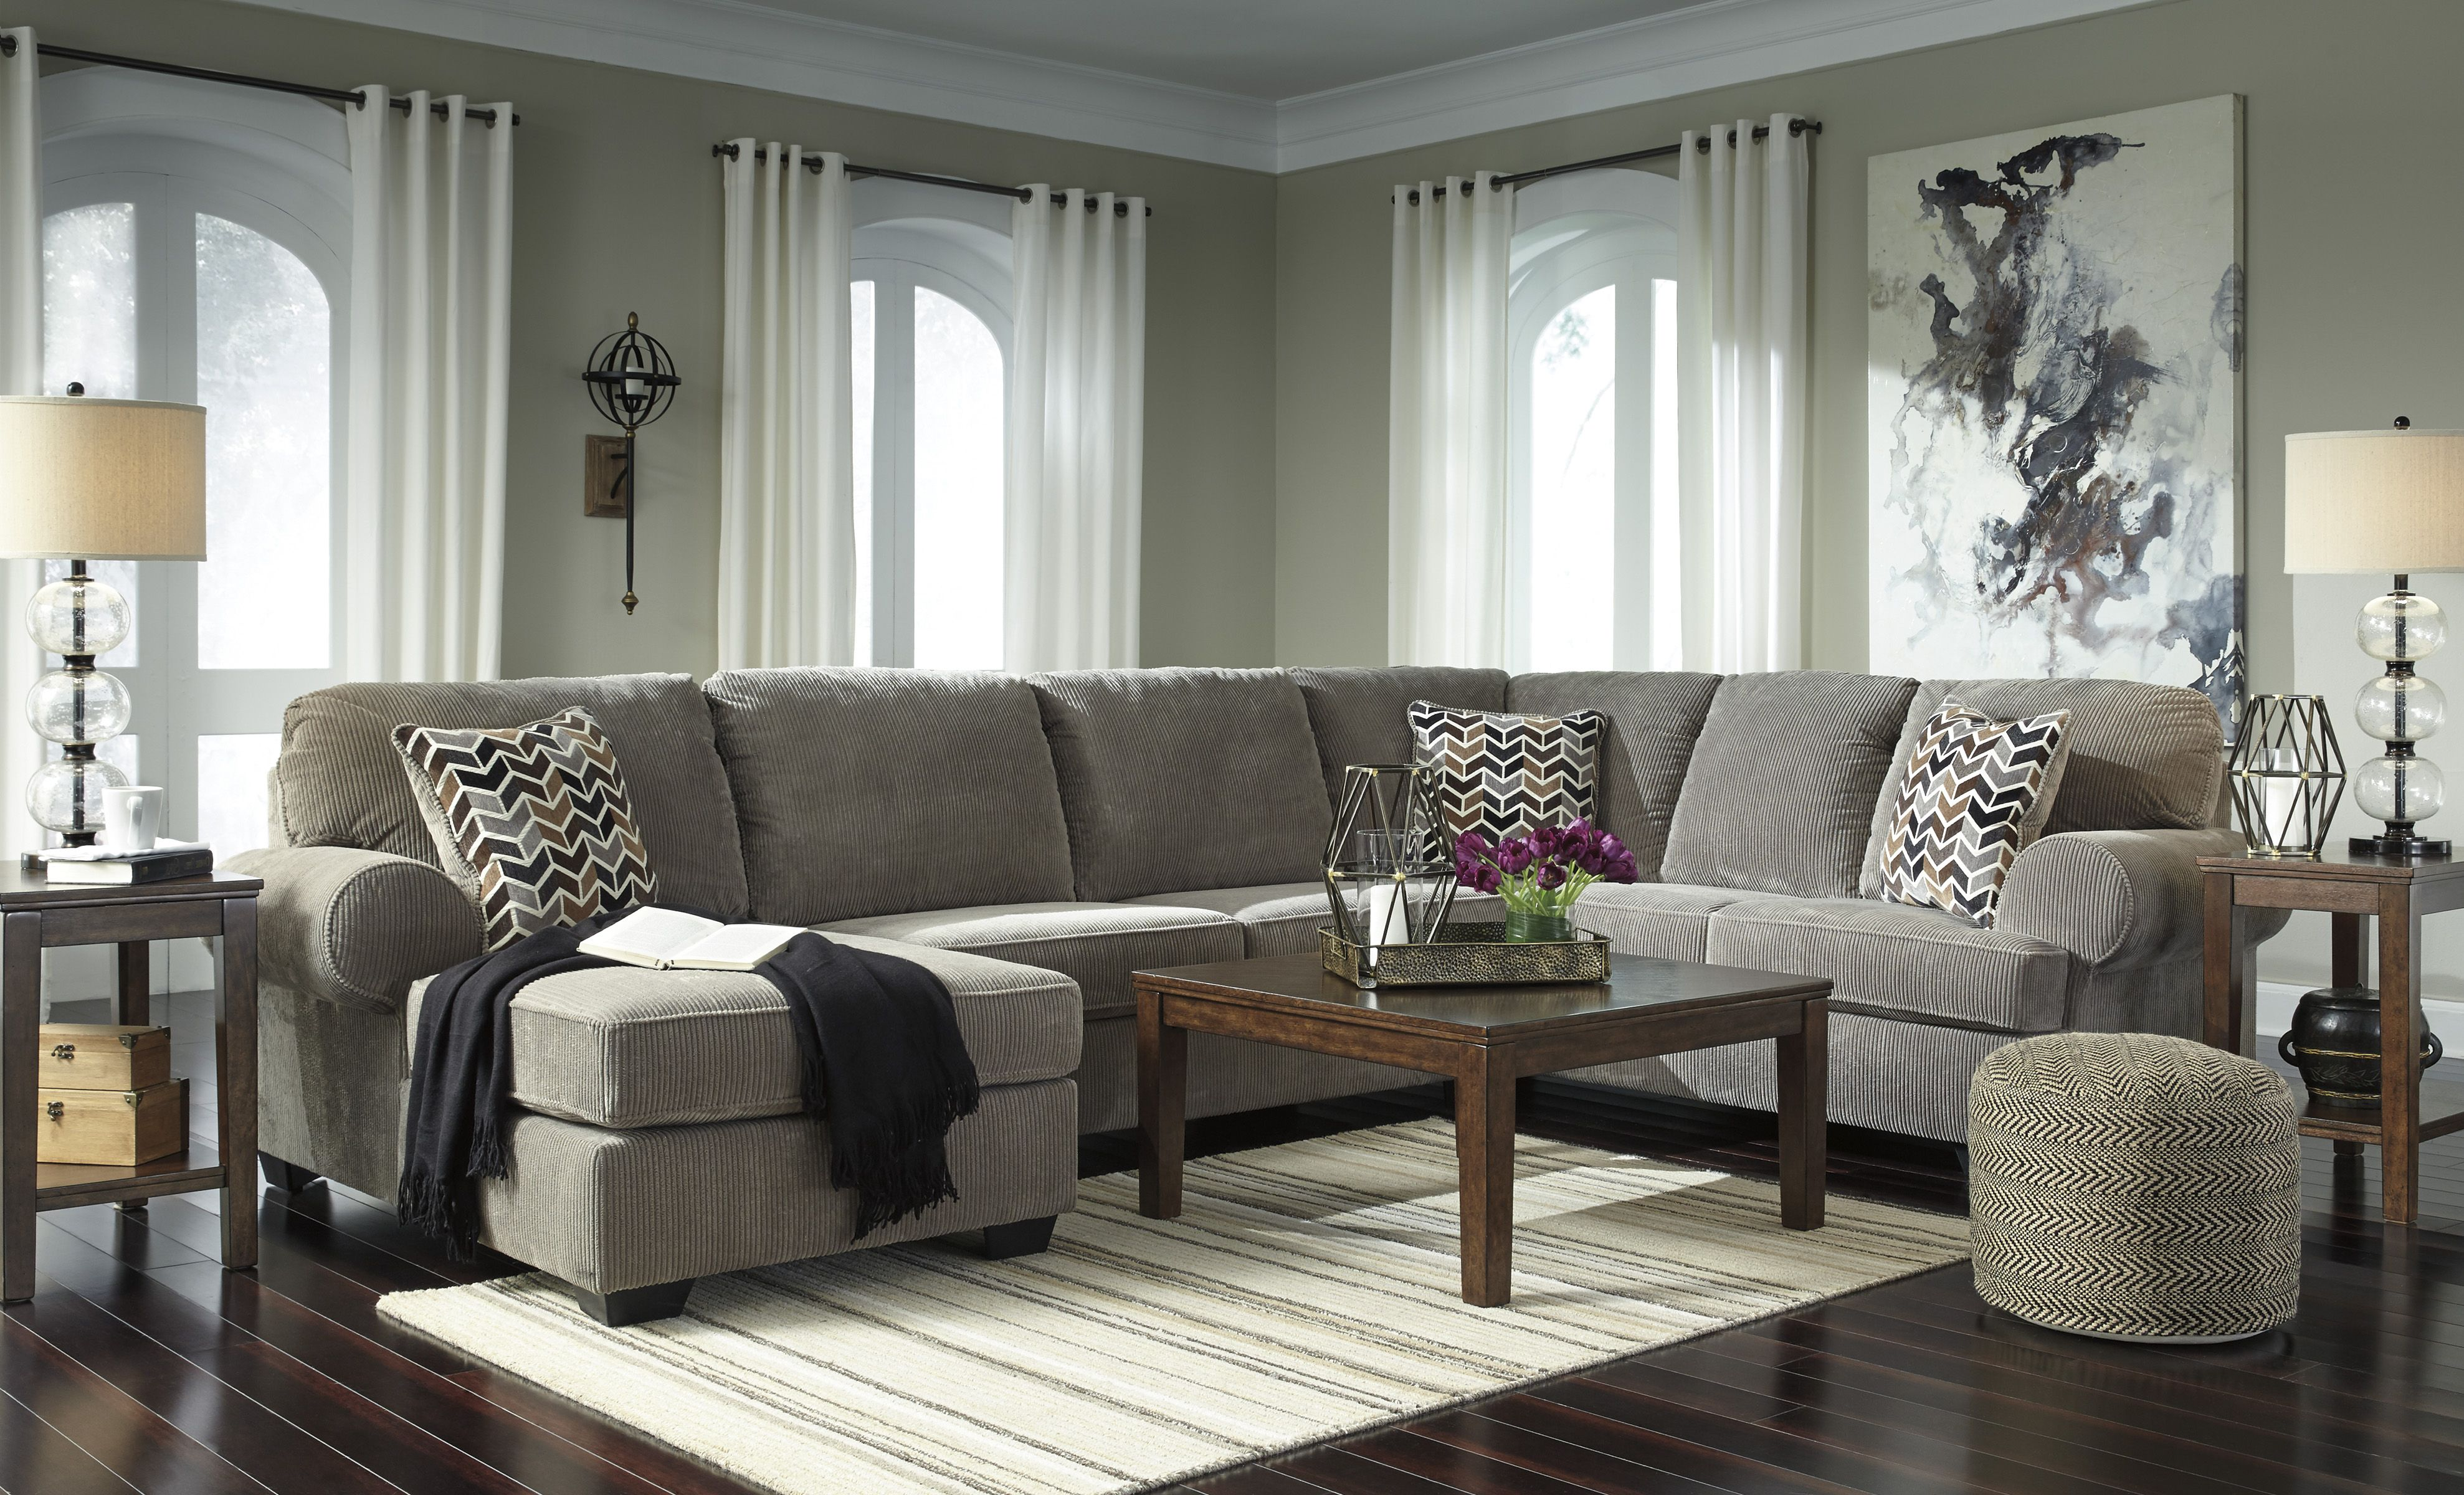 60 Living Room Ideas Living Room Furniture Love Seat #warnerton #chocolate #power #reclining #living #room #set